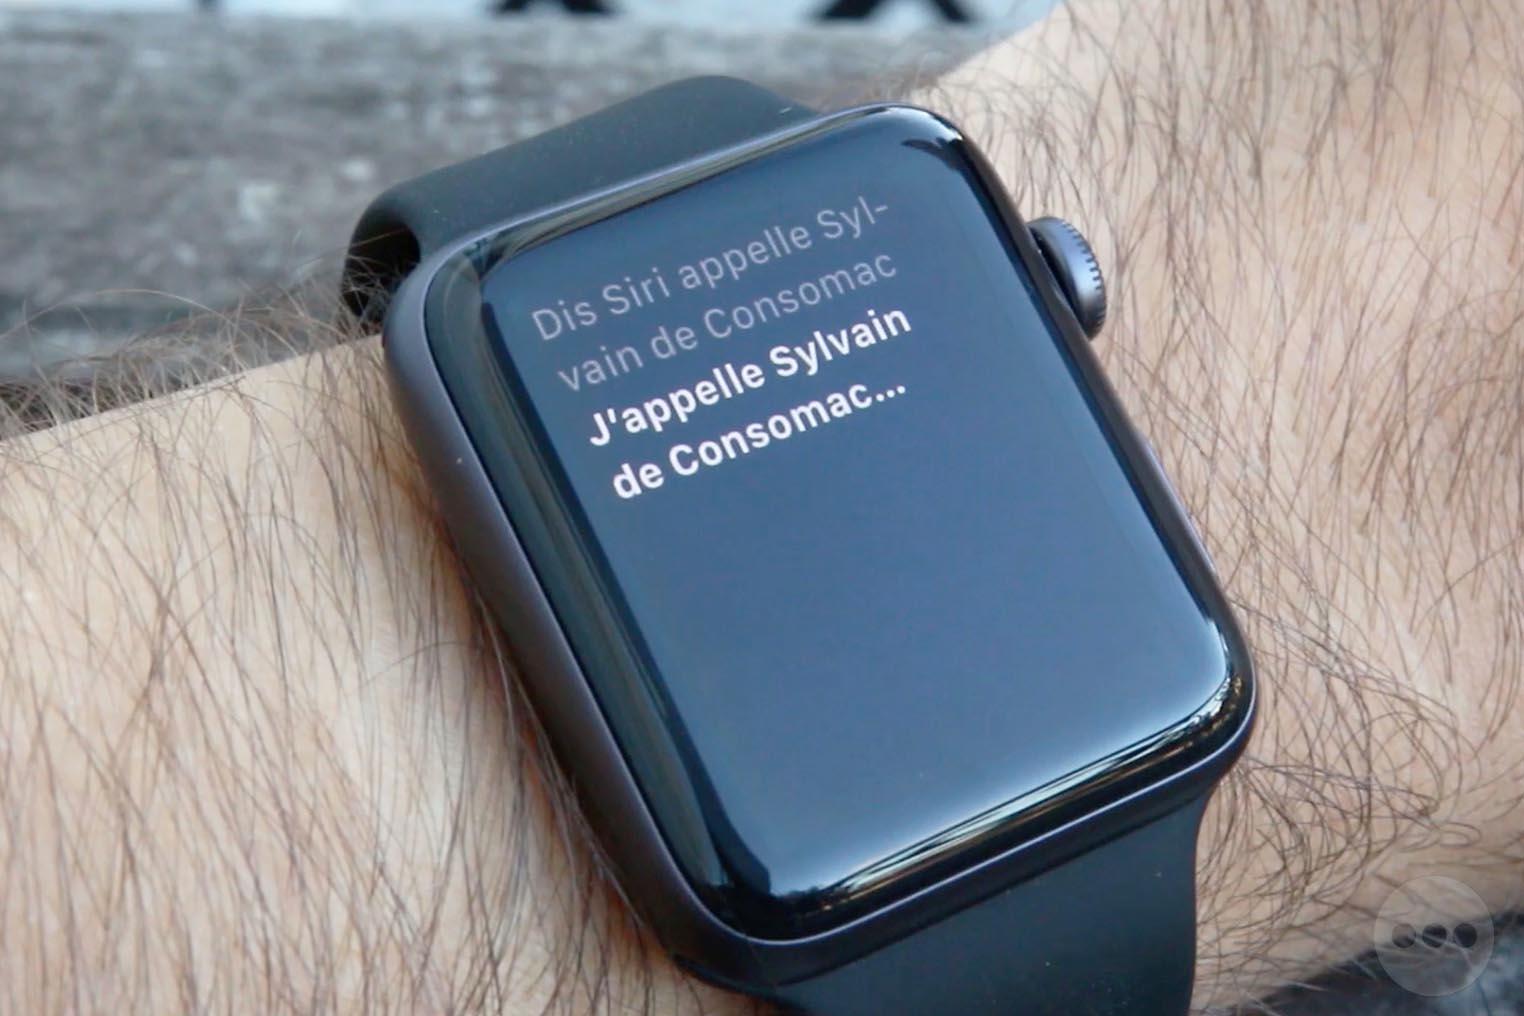 Dis Siri Apple Watch 3